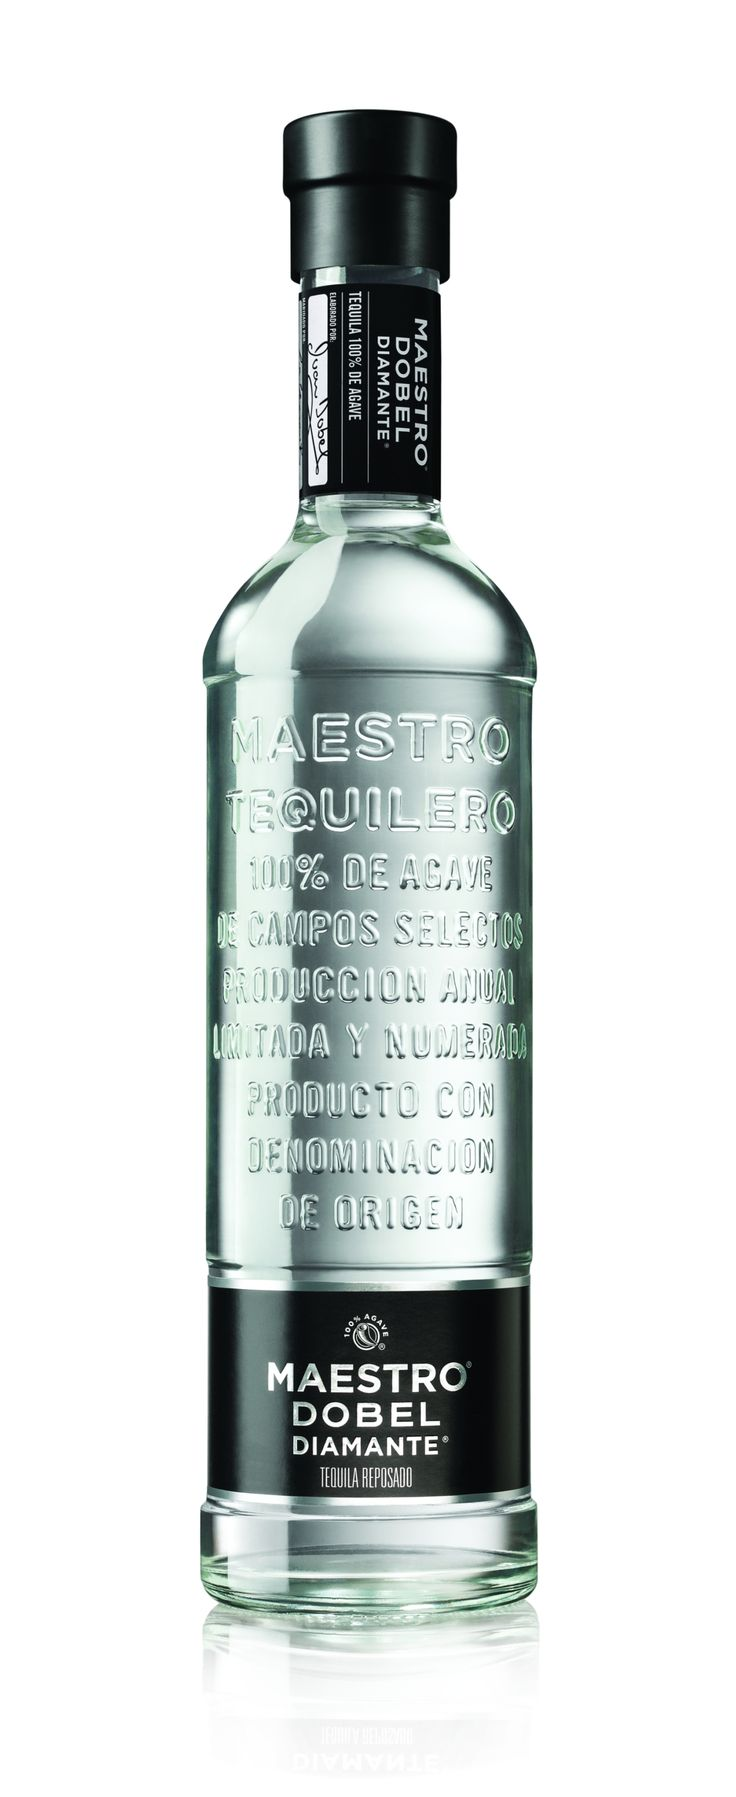 tequila el maestro tequilero dobel diamante - Google Search